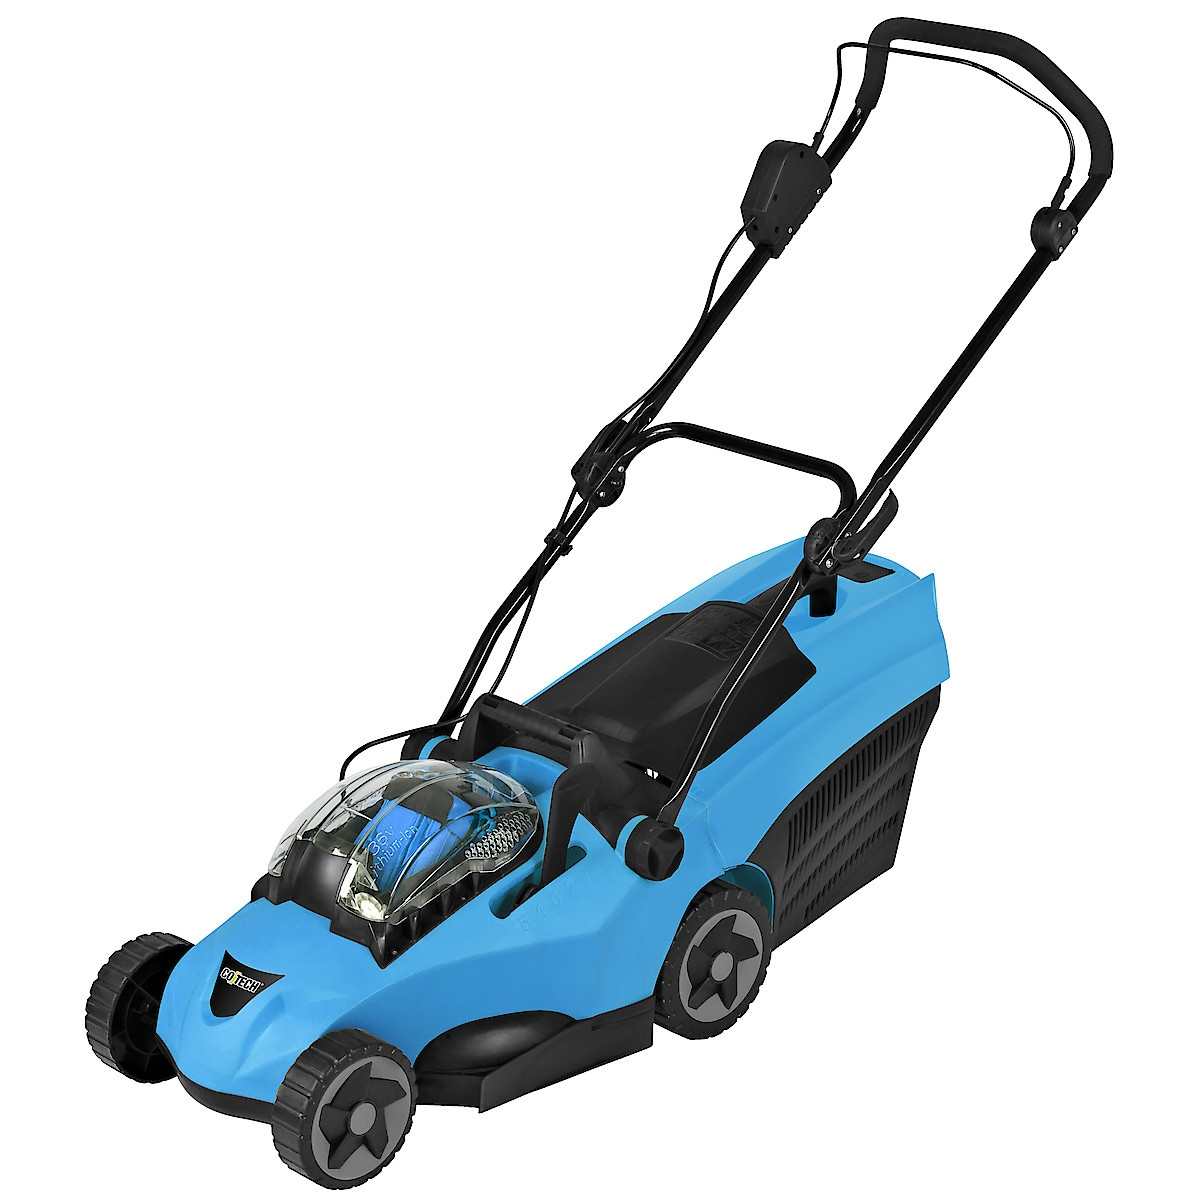 Lawnmower 36V LI Cotech